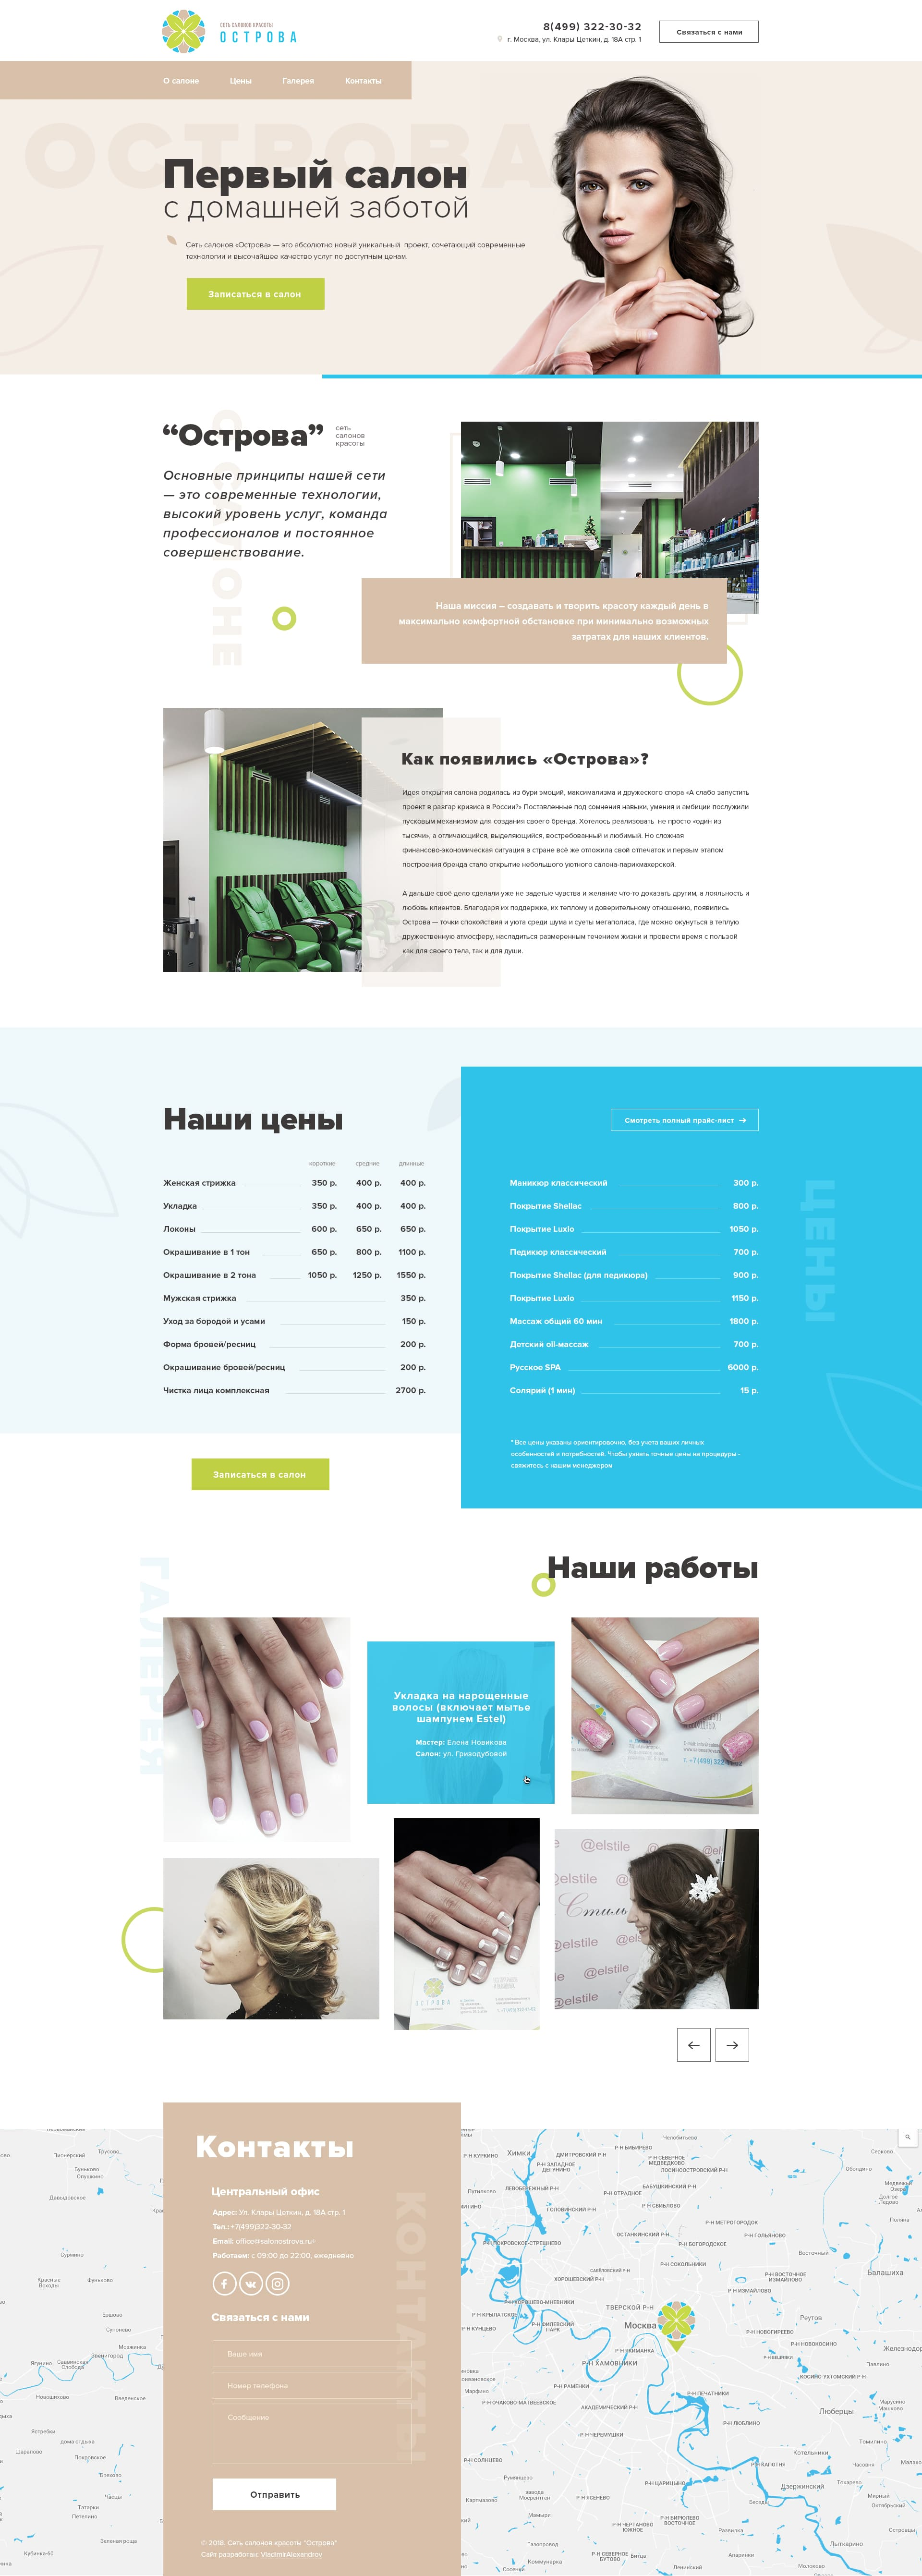 https://vladimir-alexandrov.com/wp-content/uploads/2018/06/Ostrova4-min.jpg